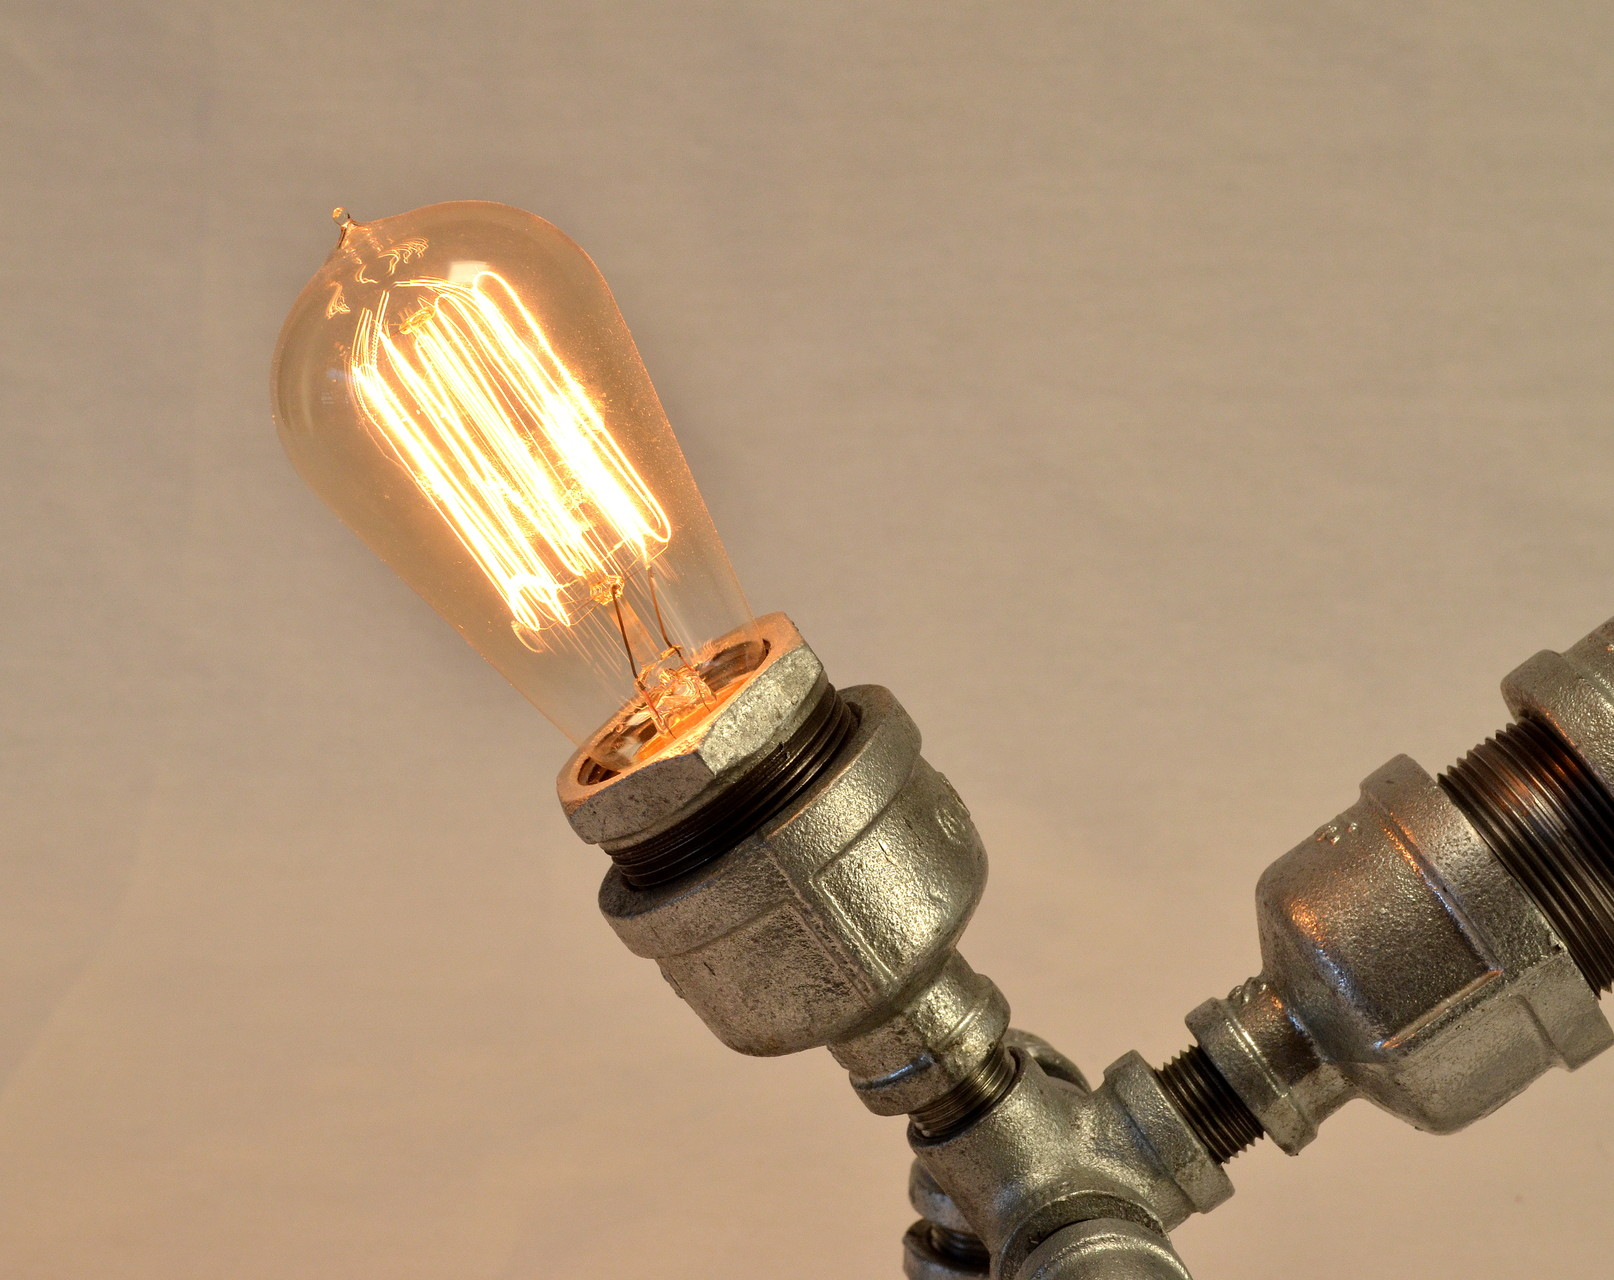 Dwog's beautiful 40 watt Edison-style hand-wound light bulb.